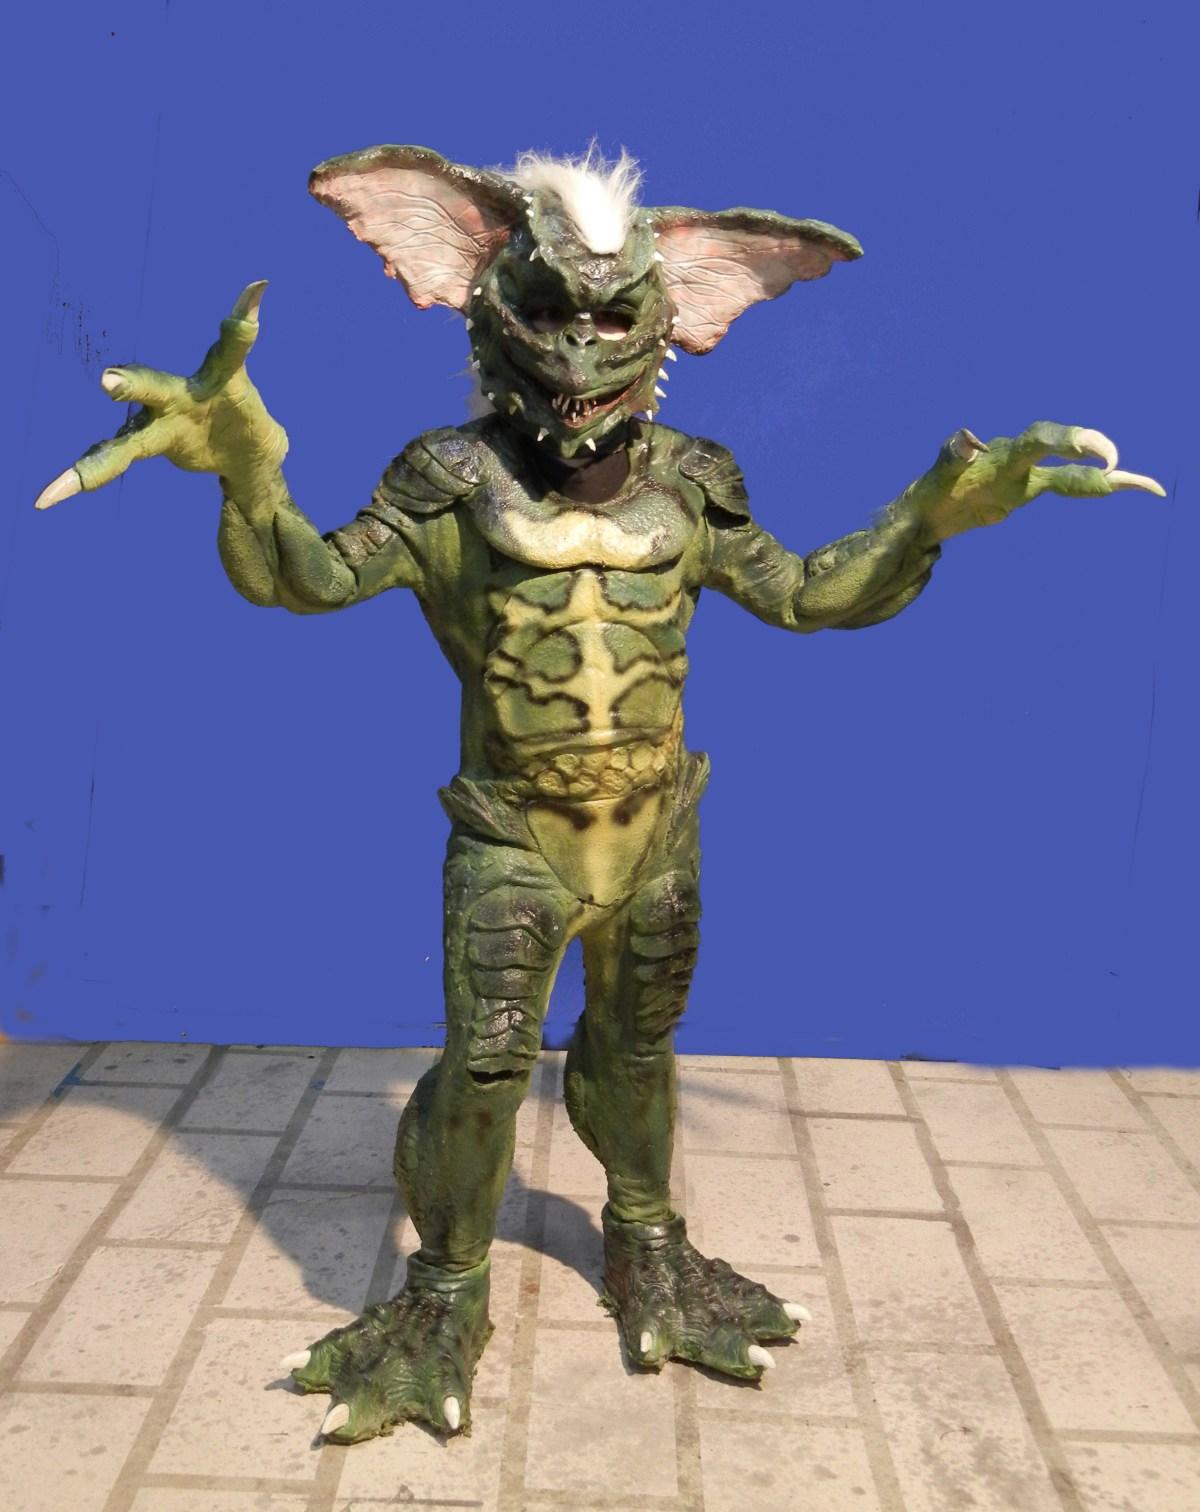 Gremlin Costume